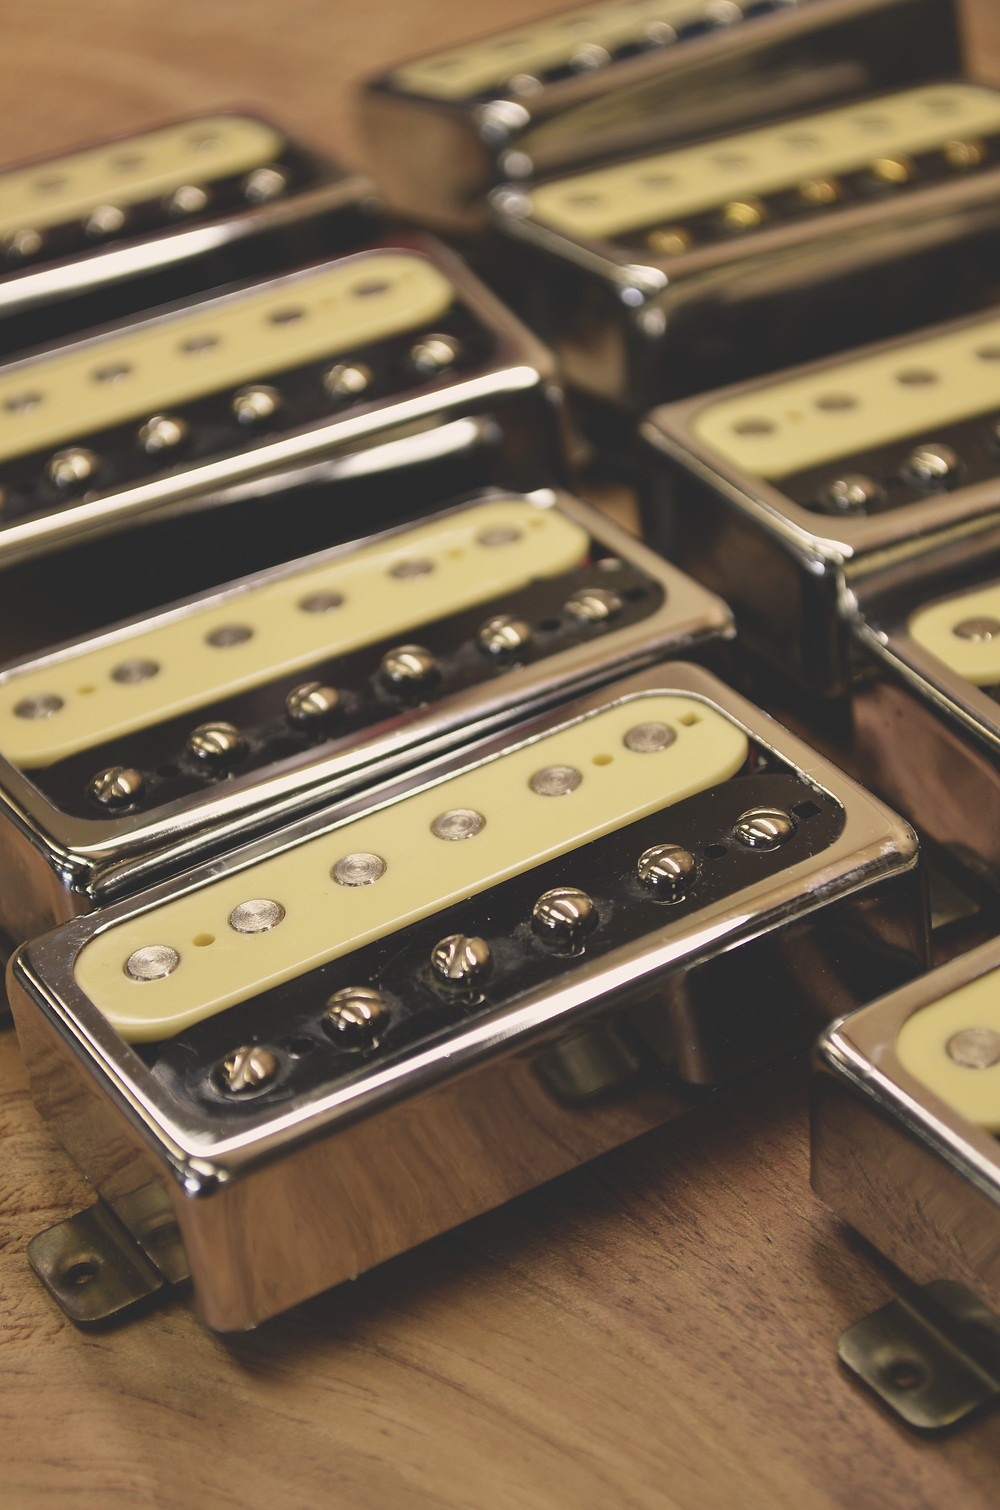 aPurla handcrafted guitars Humbucker pickups